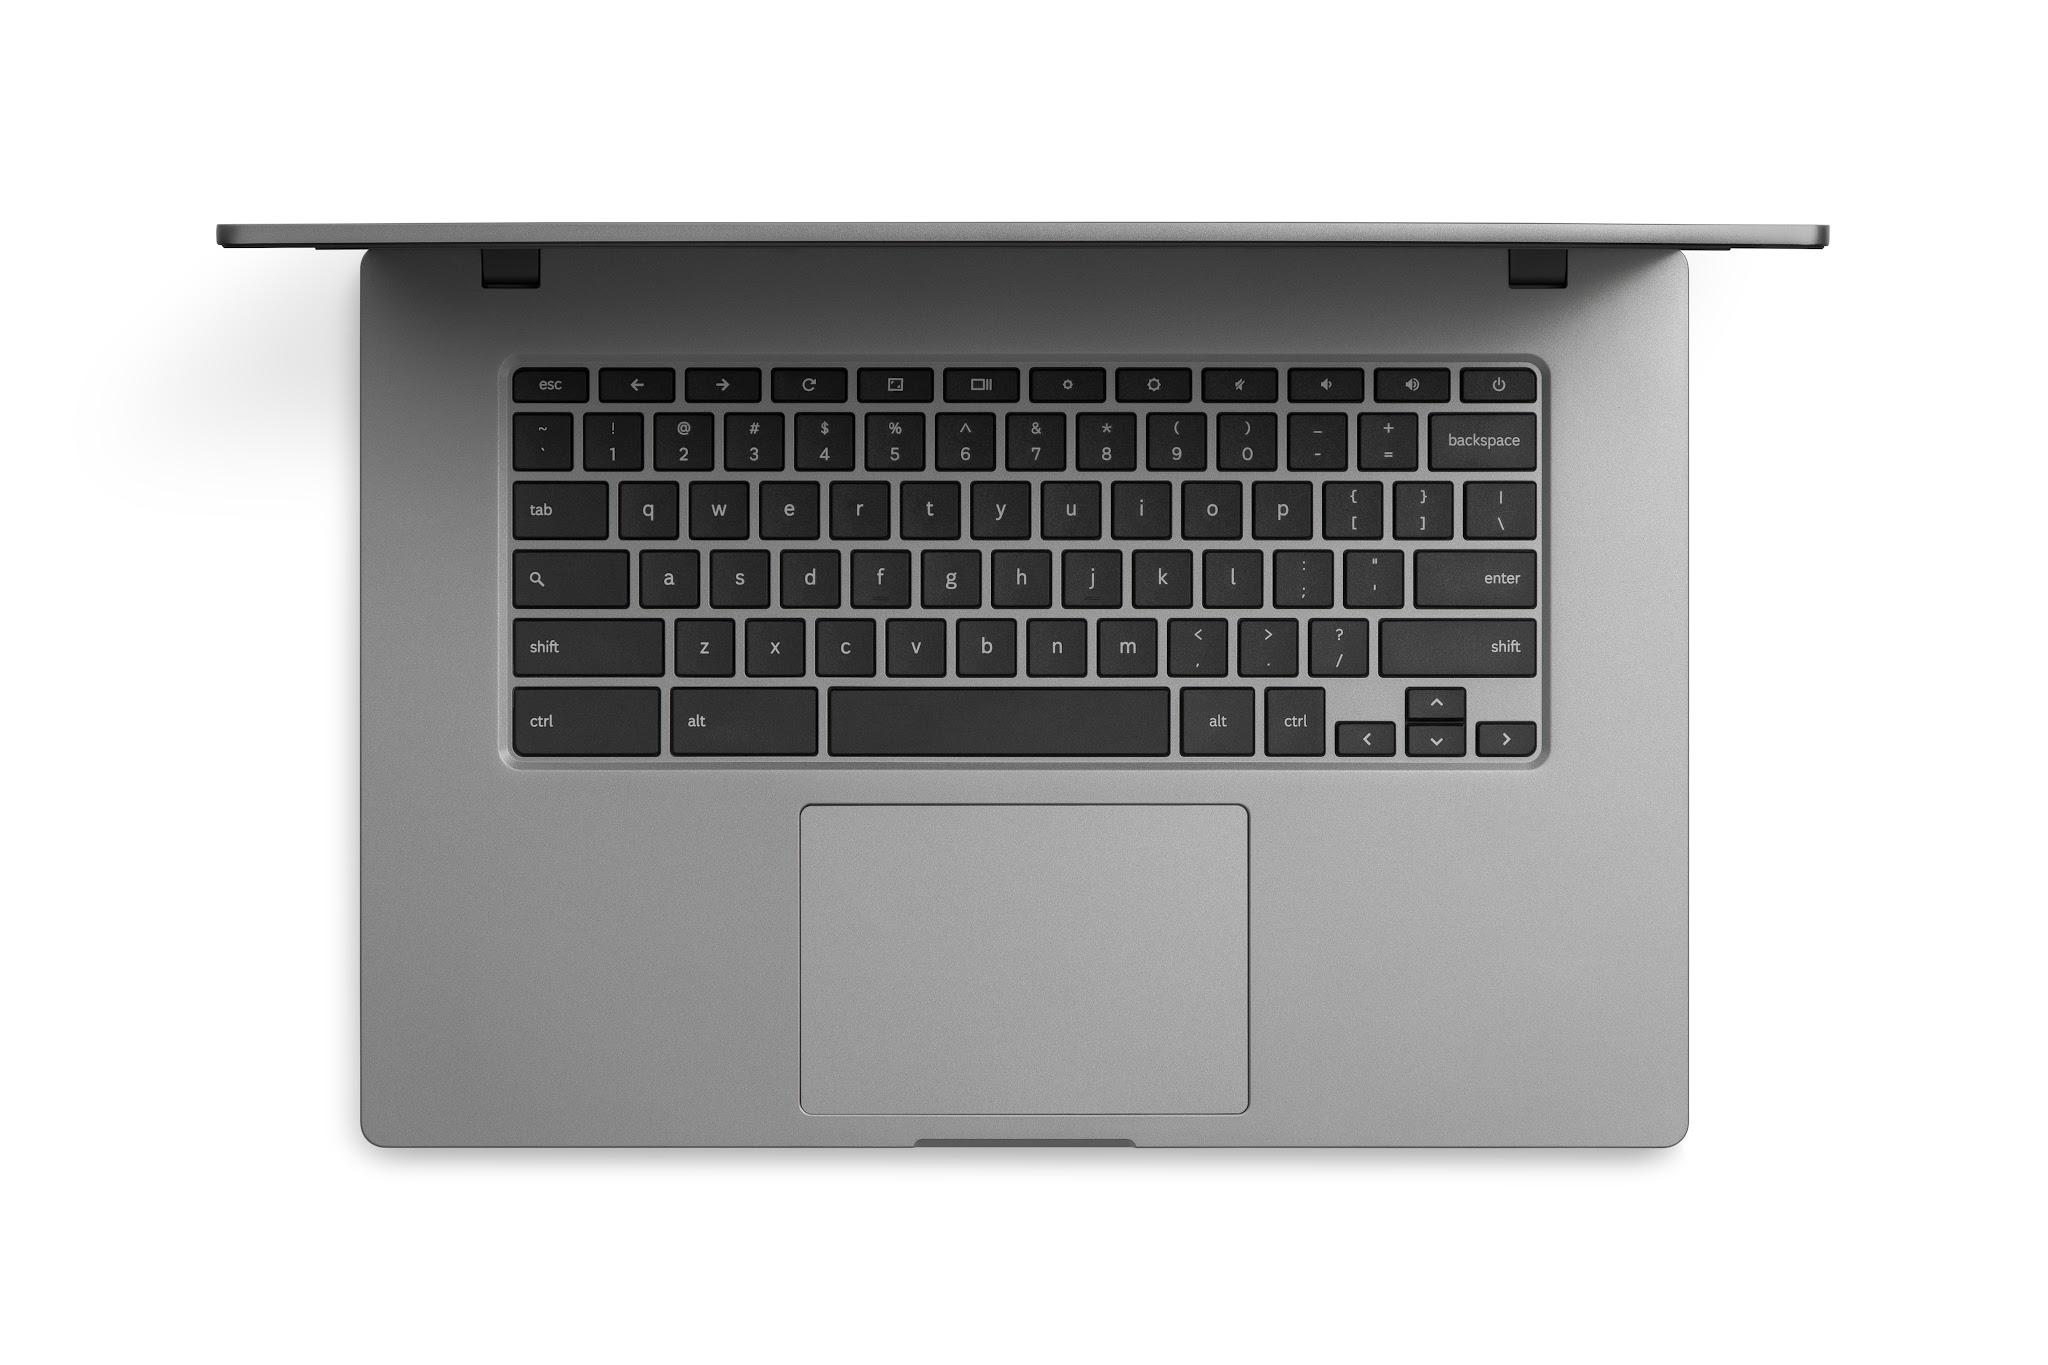 Samsung Chromebook 4+ - photo 3